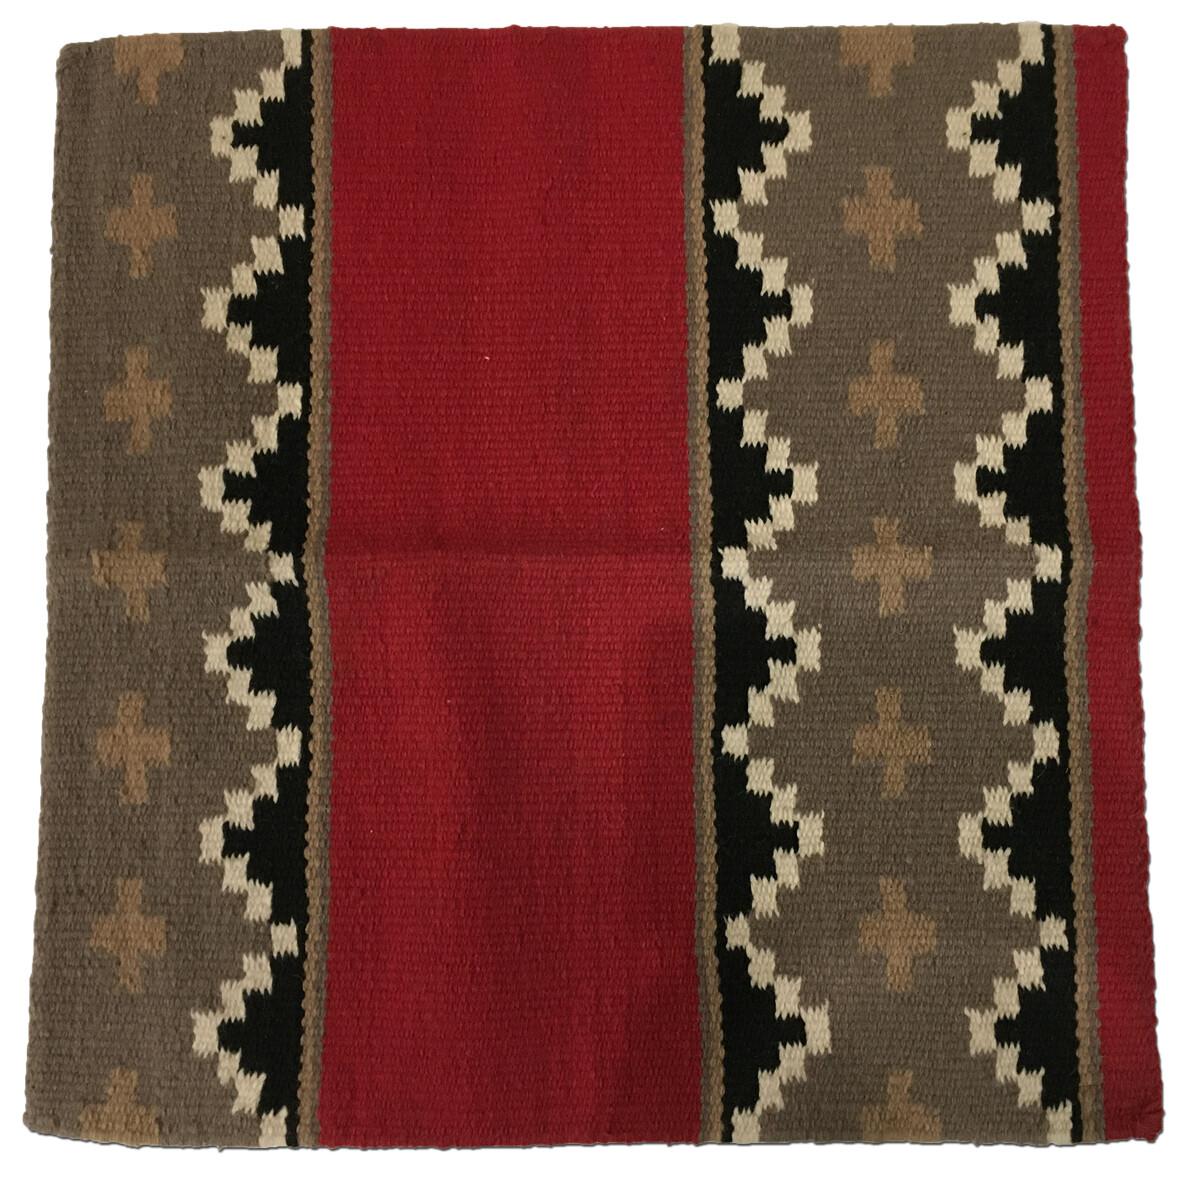 4lb Saddle Blanket #7B Red